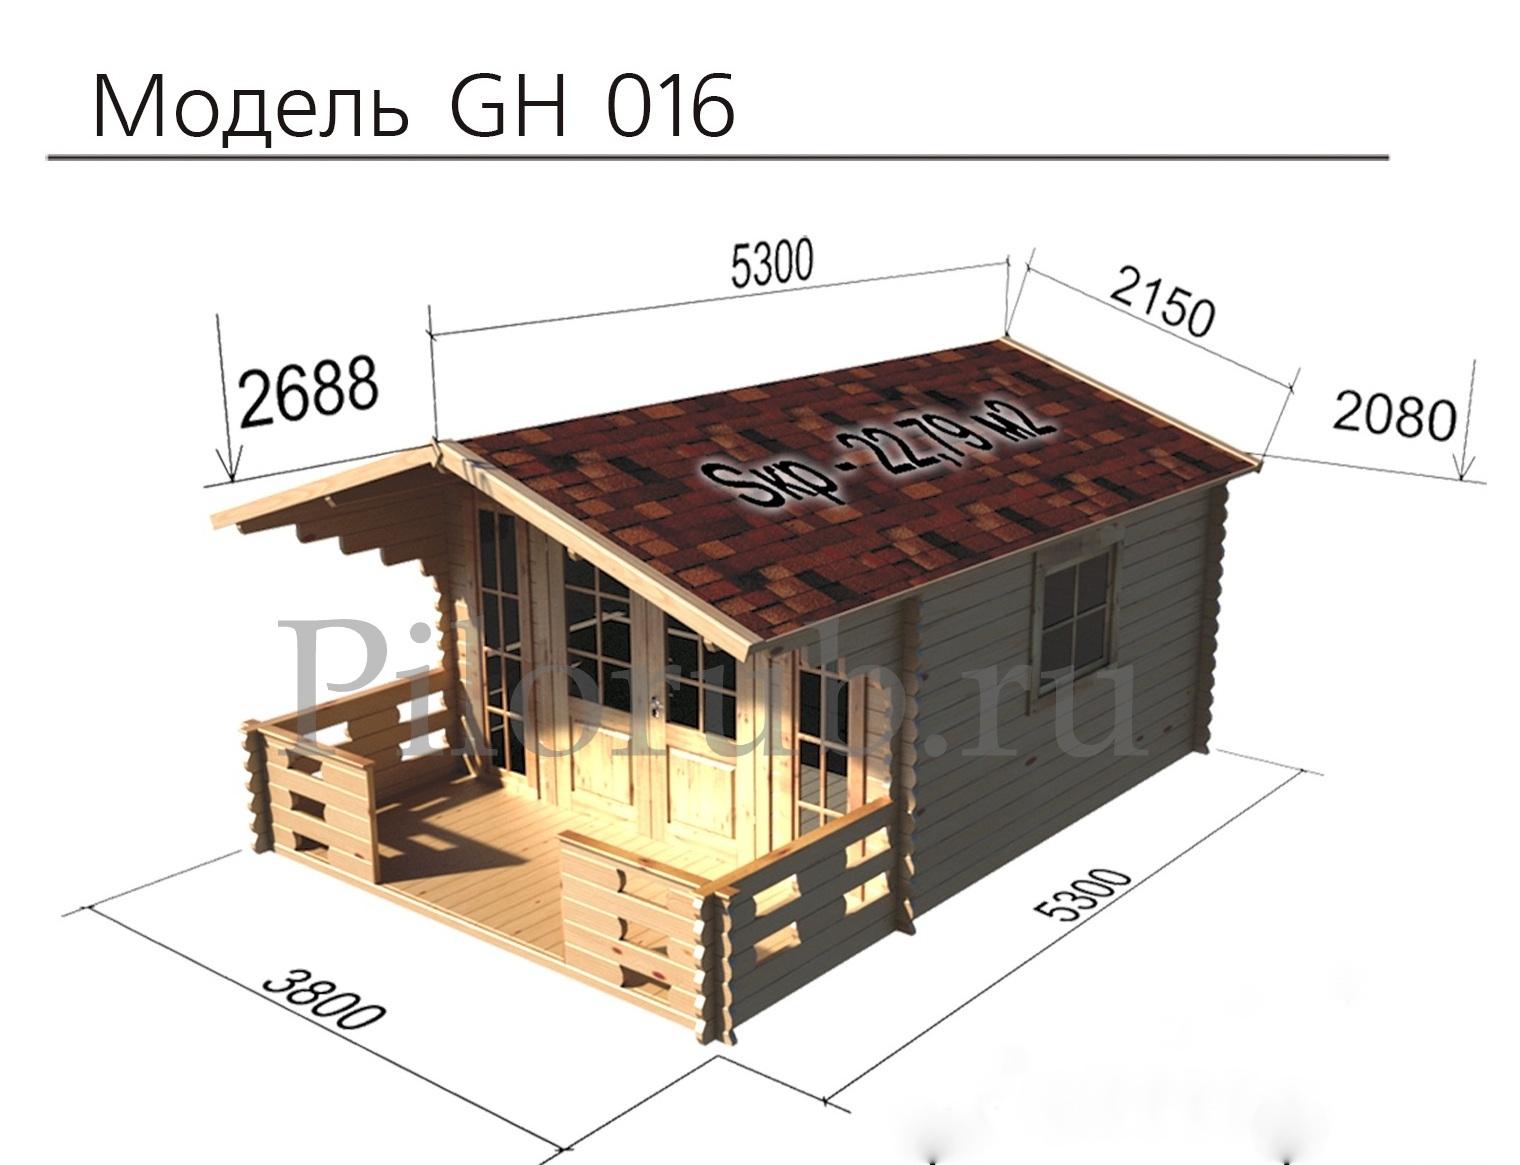 GH016